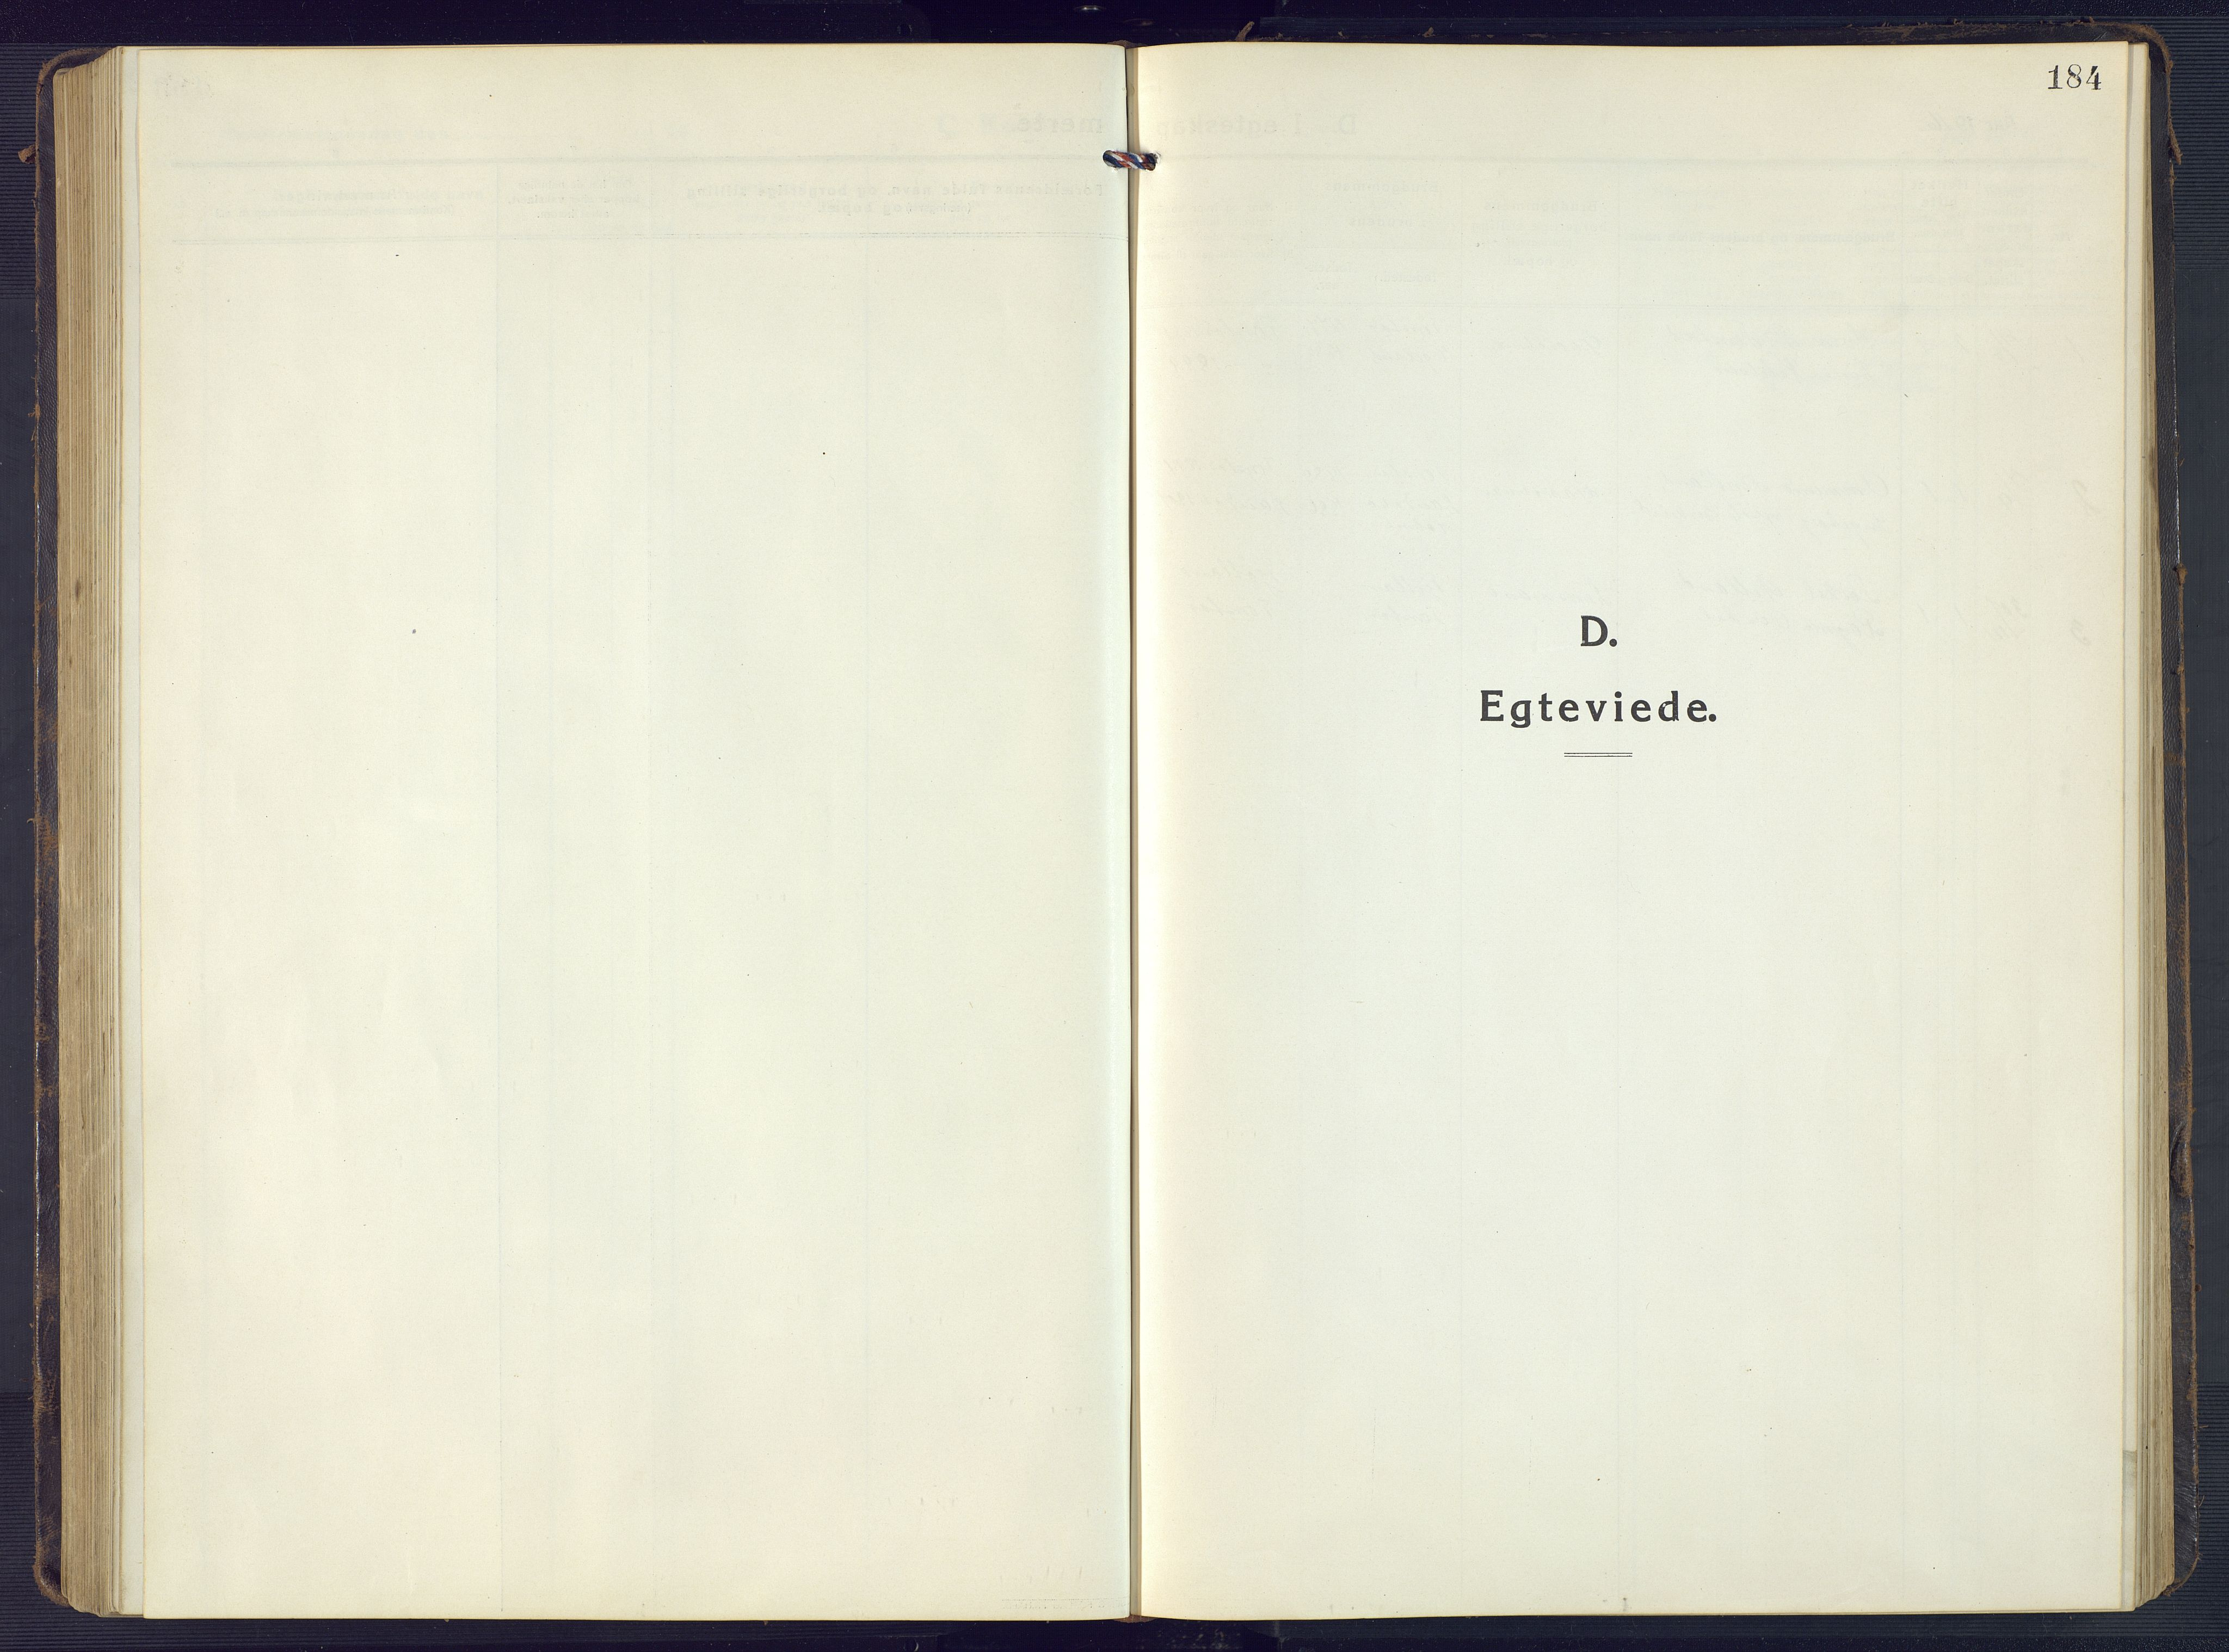 SAK, Sirdal sokneprestkontor, F/Fb/Fbb/L0005: Klokkerbok nr. B 5, 1916-1960, s. 184